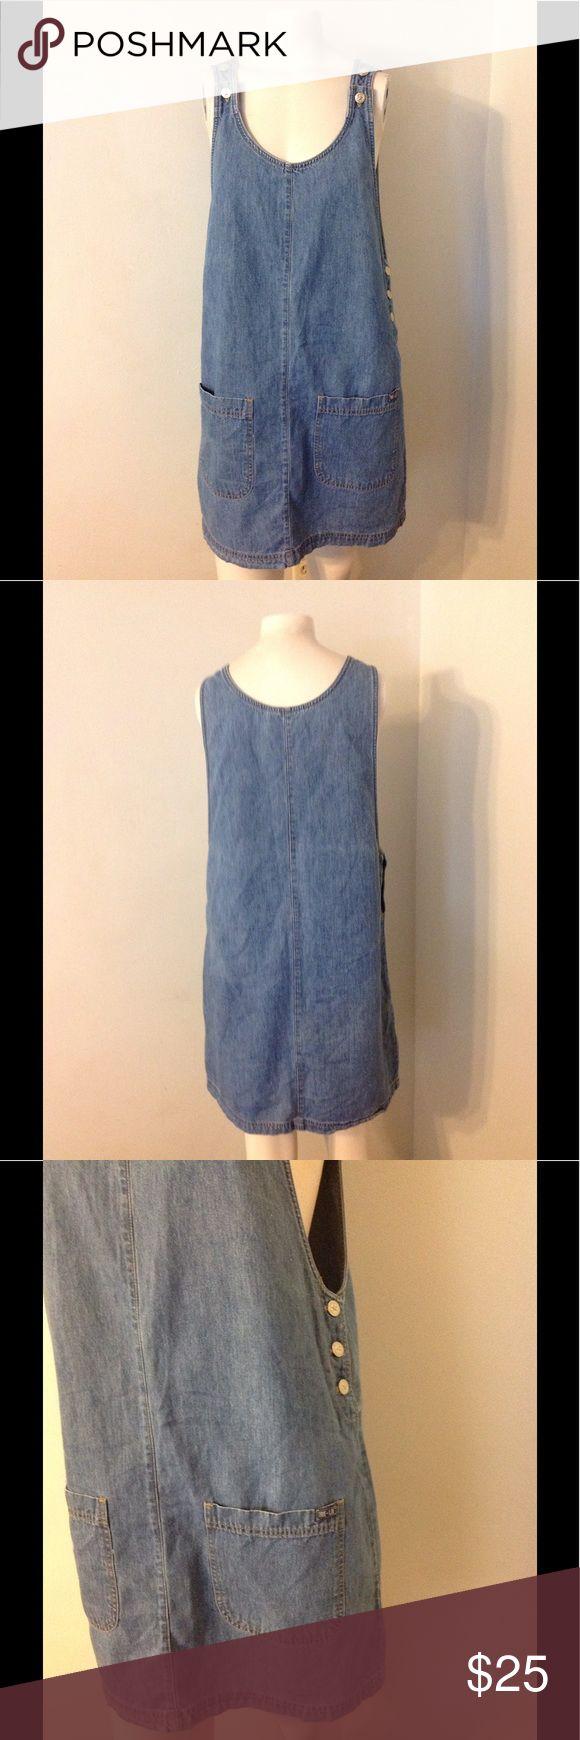 Vintage Overall Jean Jumper Dress L Cute vintage jumper dress. Made of cotton in size Large - front pockets. Nice condition Vintage Dresses